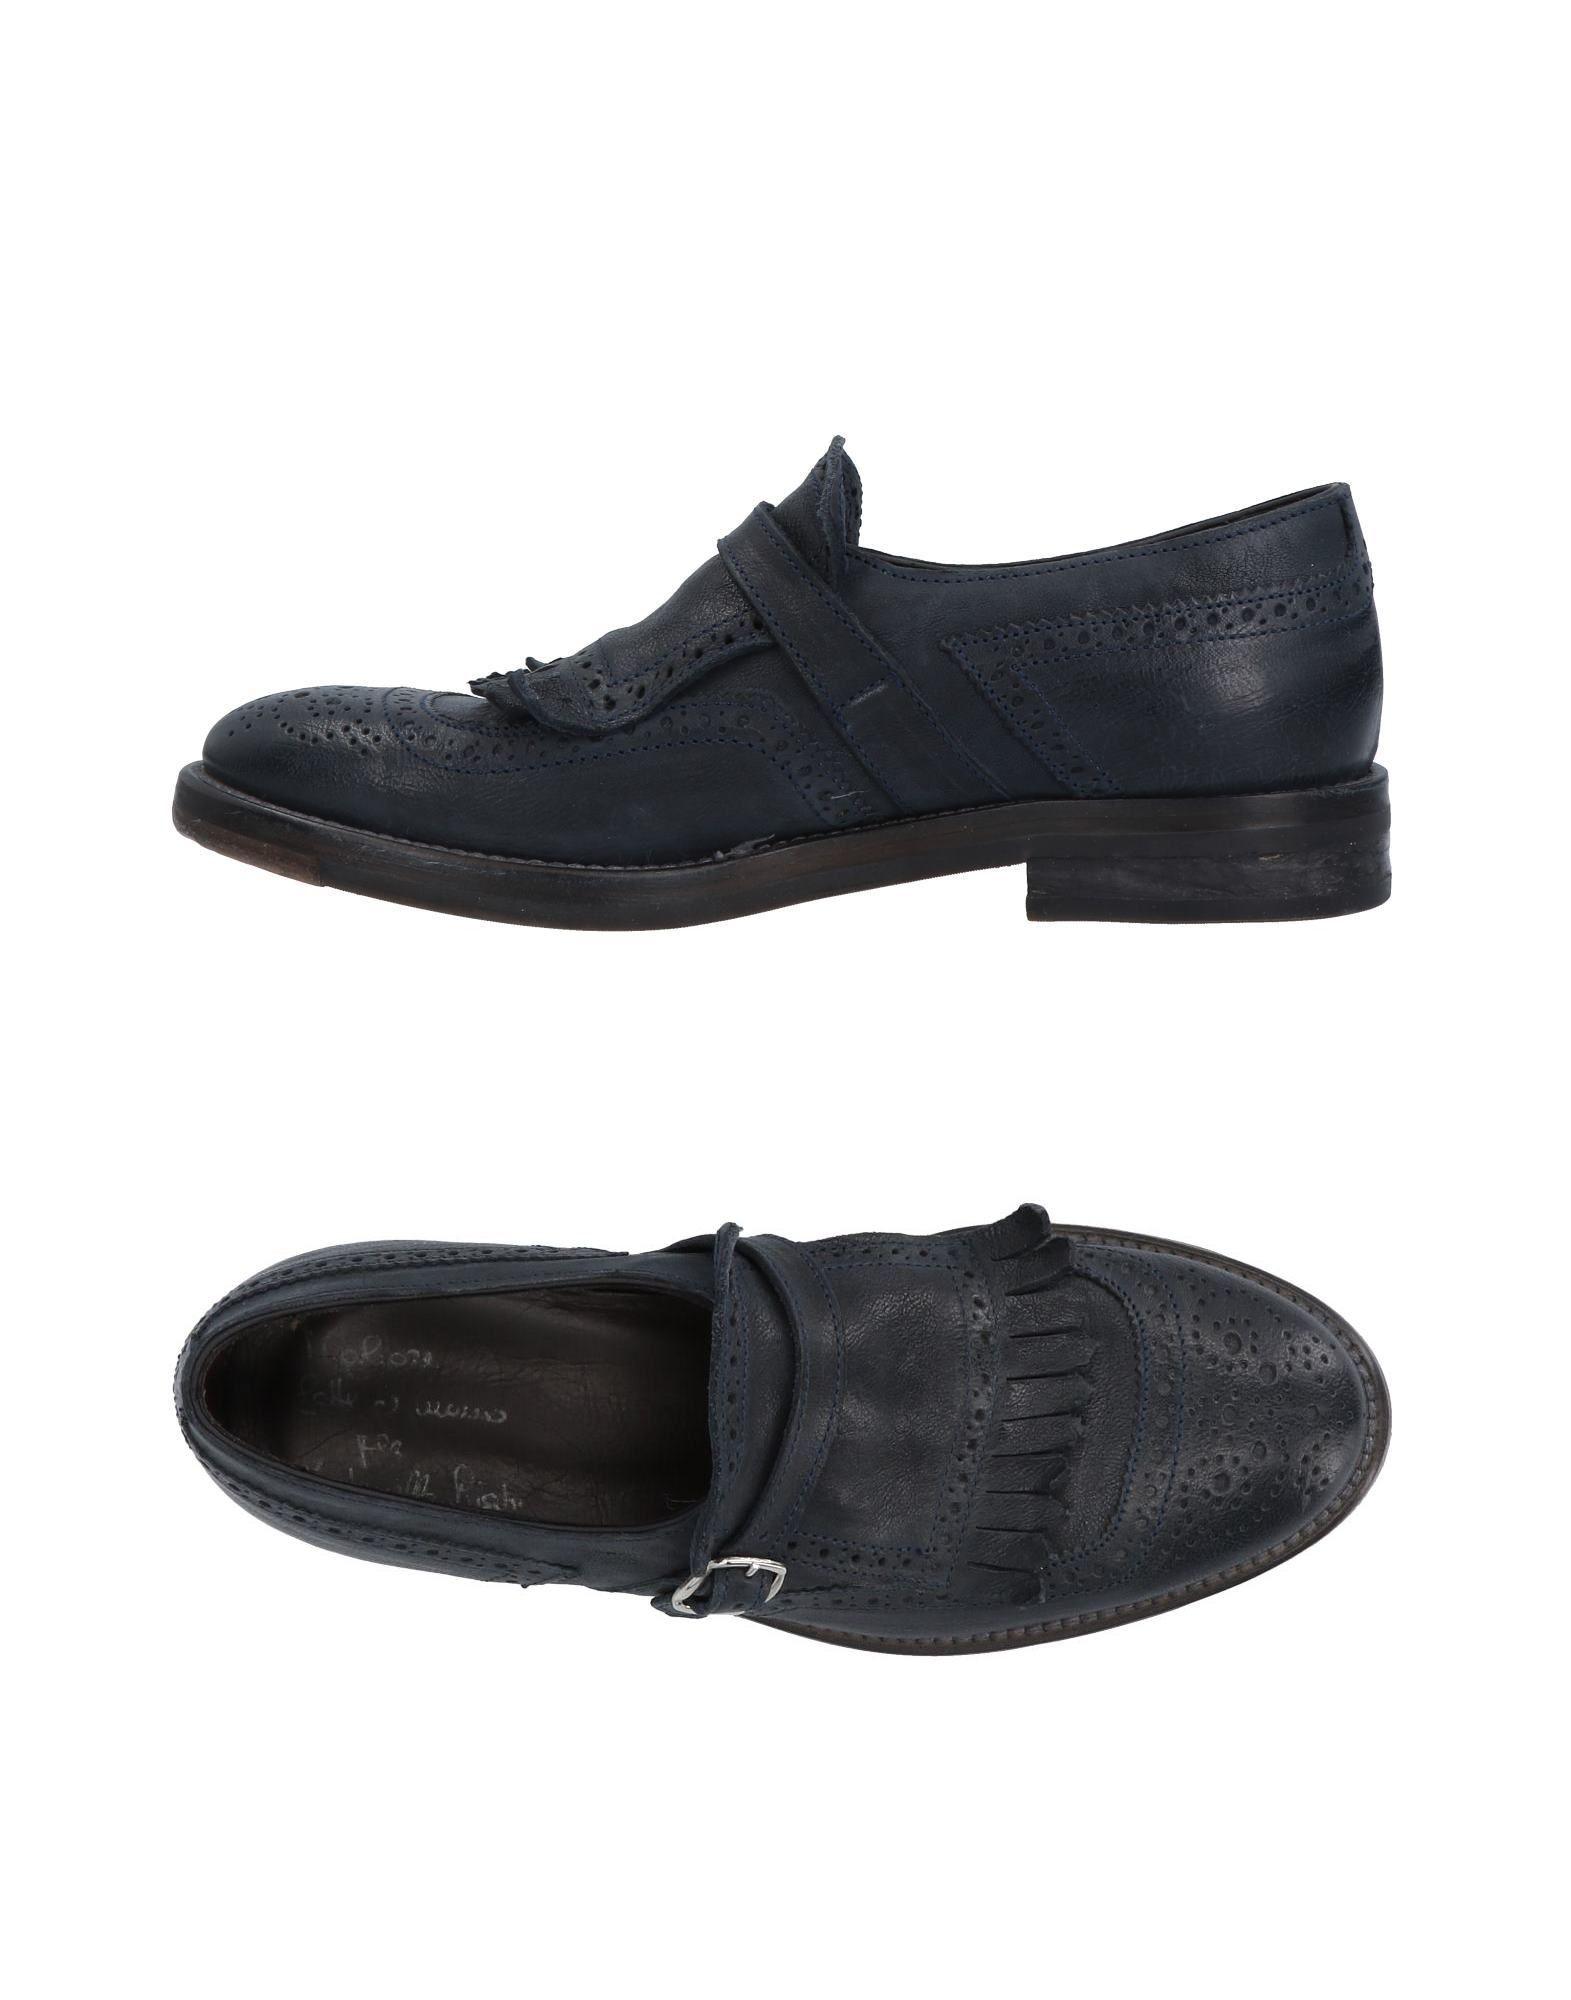 buy cheap very cheap cheap price pre order ANTONELLA RIGHI Loafers shopping online cheap price cYAA6kjexX